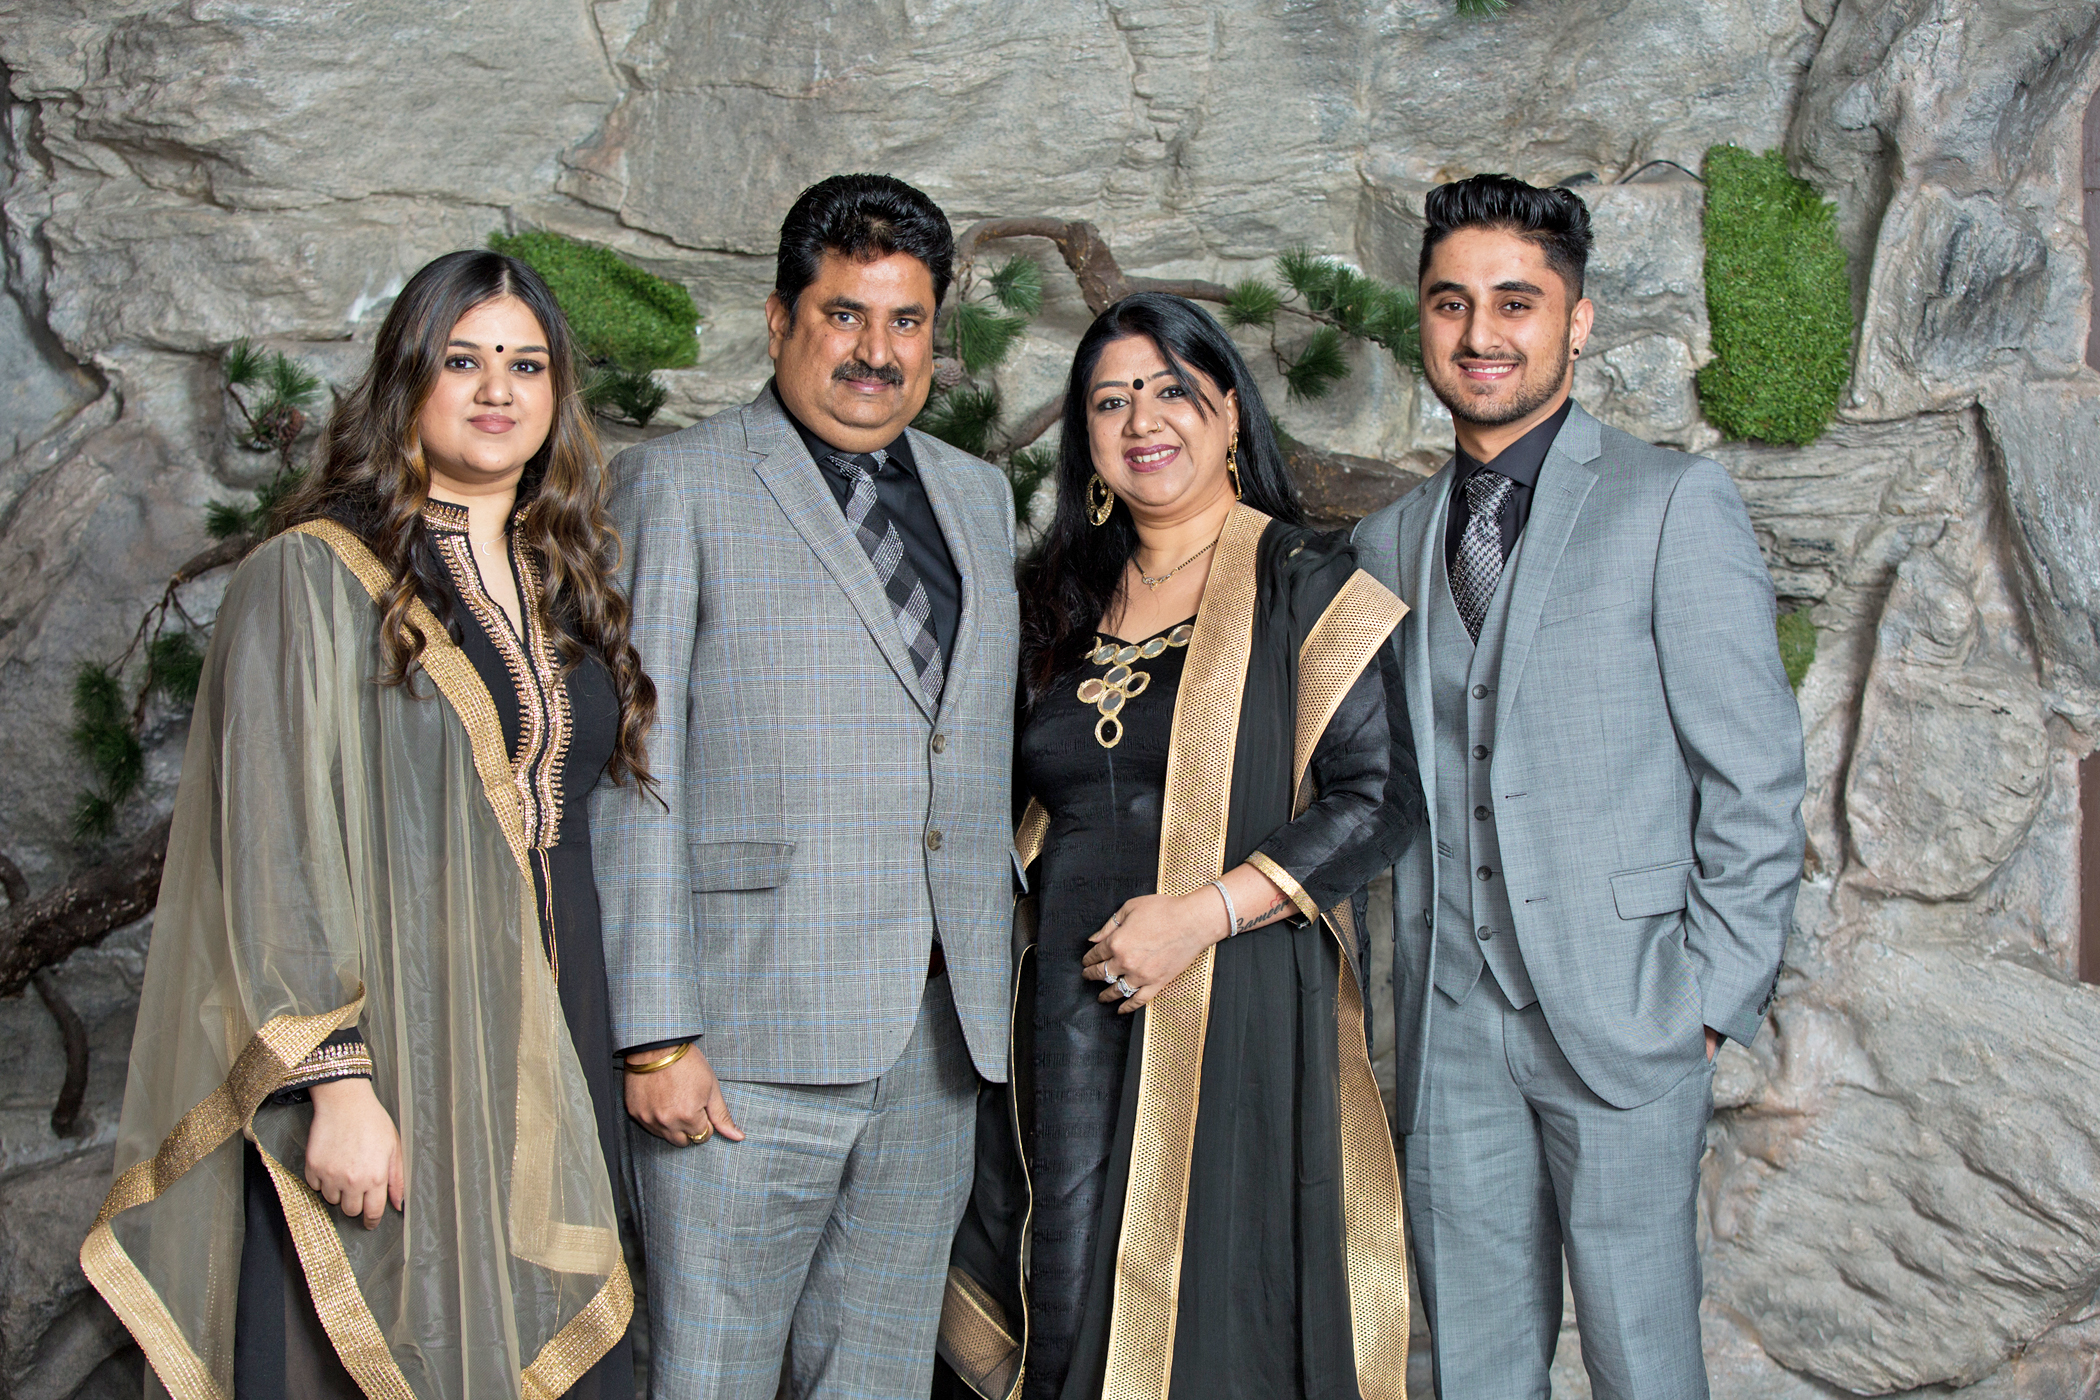 Realtor Sameer Kaushal got two awards